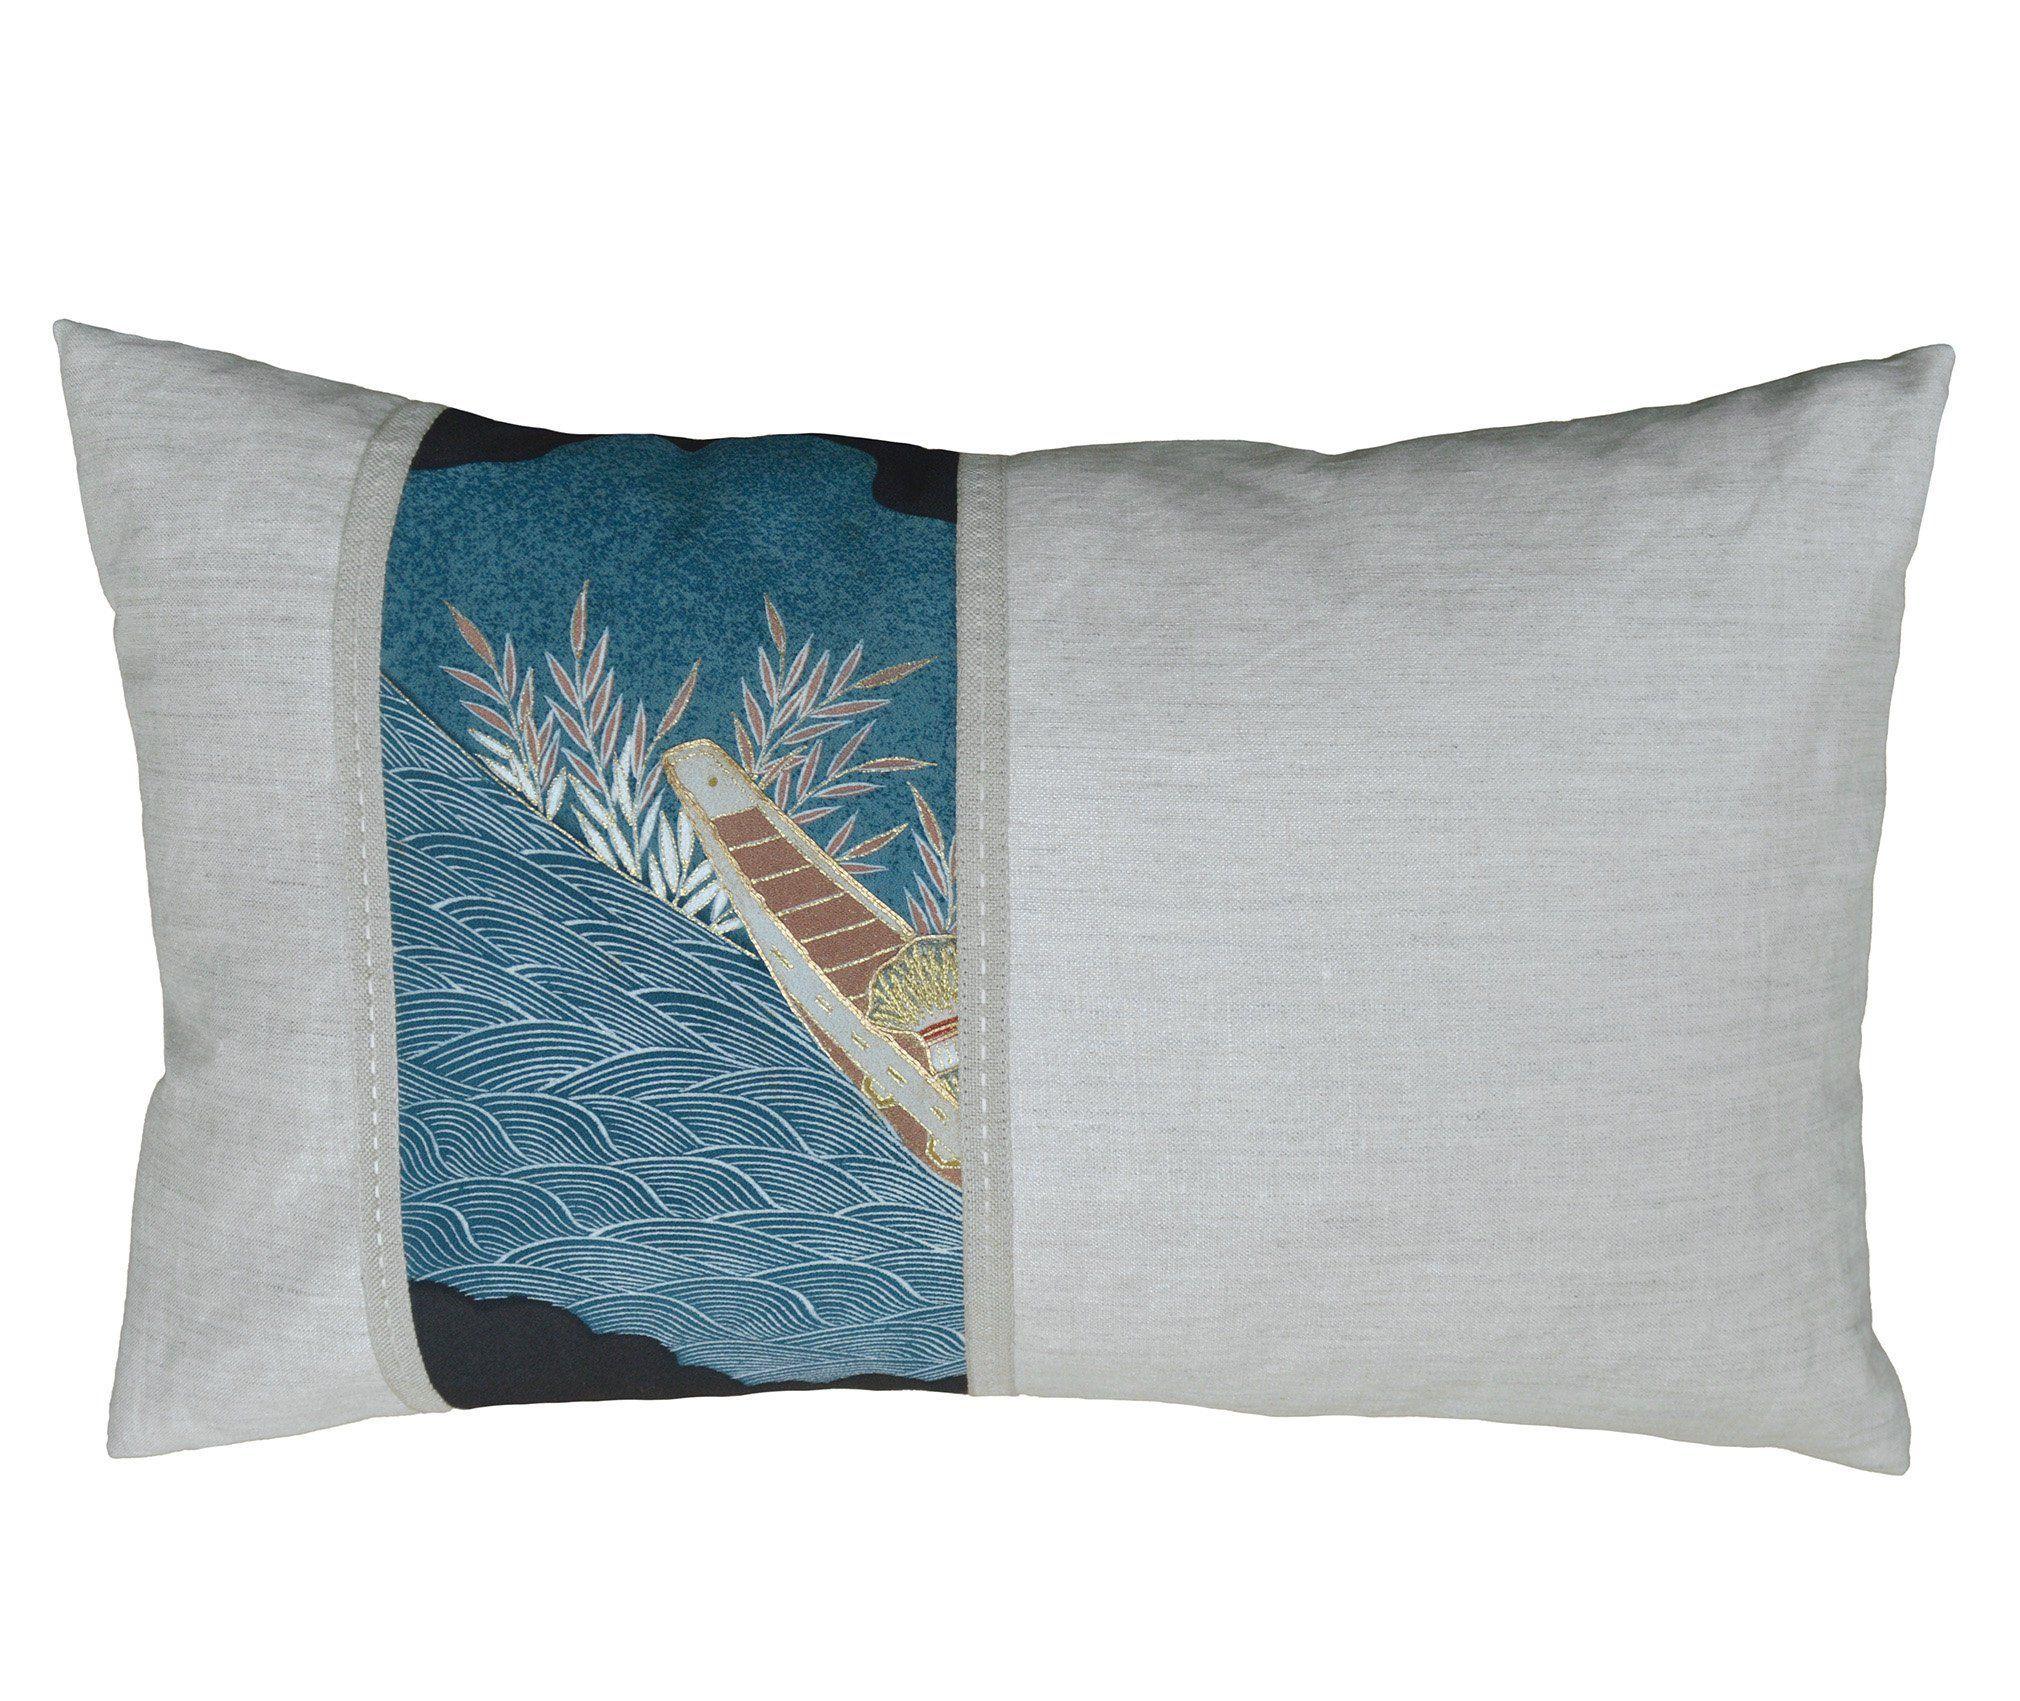 Luxurious Lumbar Pillow Cover Vintage Japanese Kimono Silk Etsy Pillows Lumbar Pillow Cover Vintage Japanese Kimono